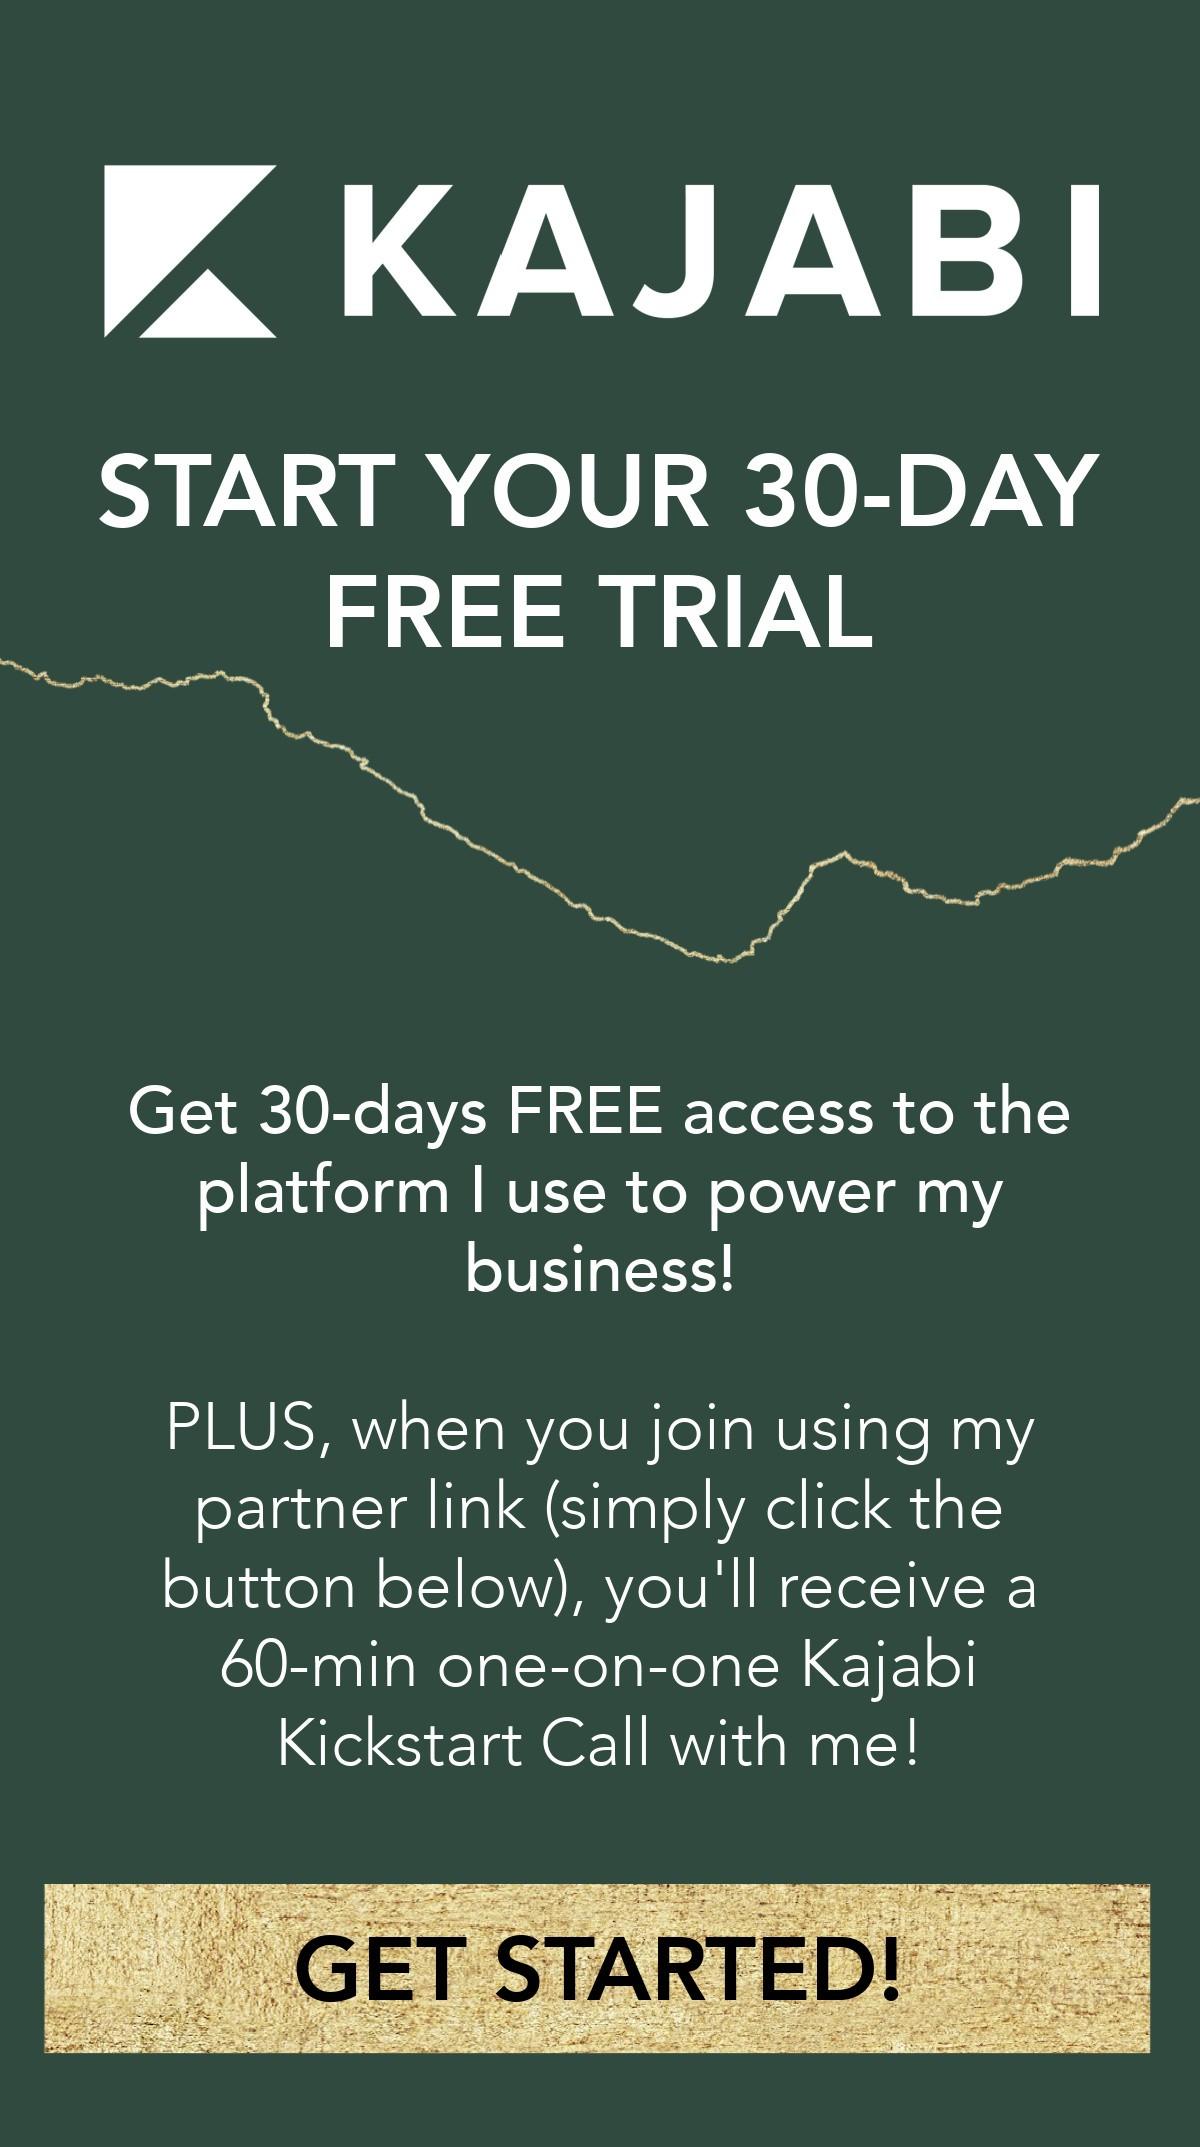 Kajabi 30 Day Free Trial